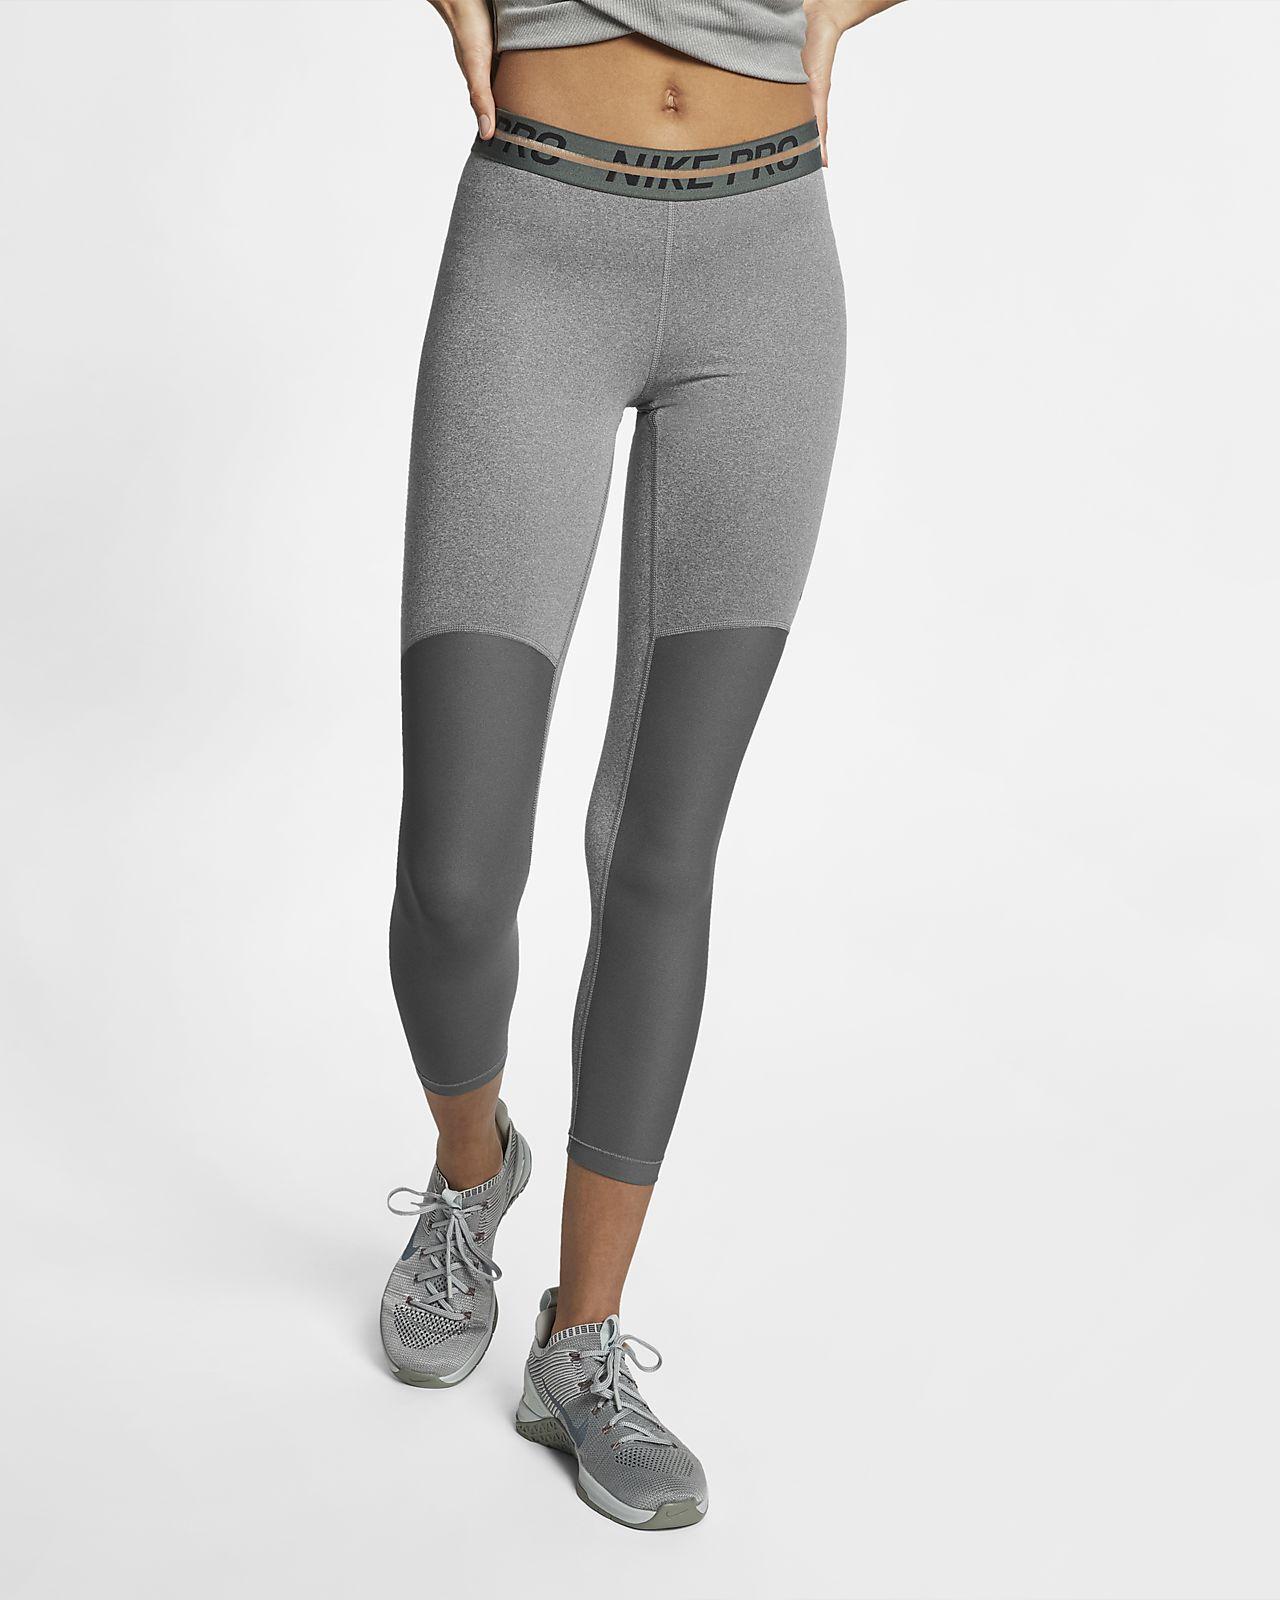 Nike Pro Women's 7/8 Tights